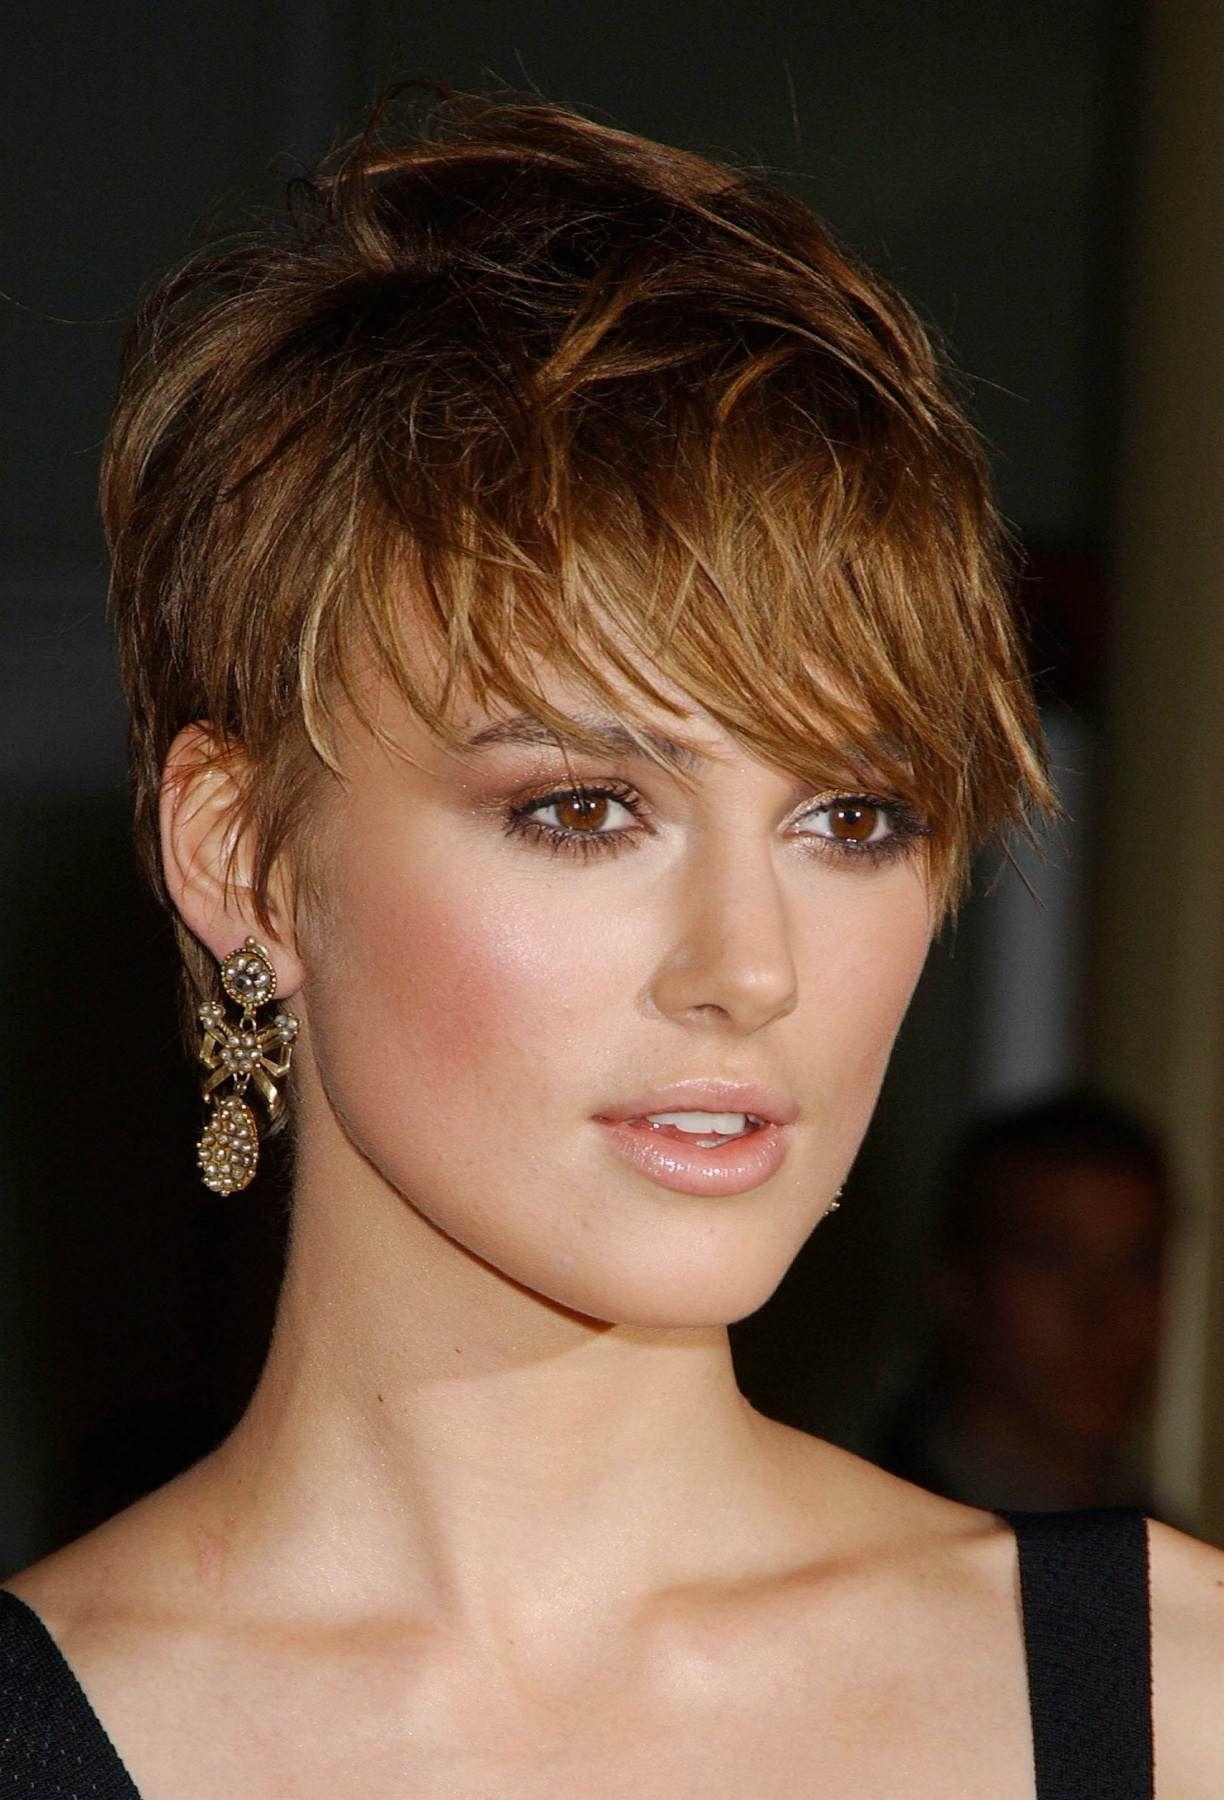 Keira knightley short pixie cut hairdos pinterest short pixie pixie cut and pixies - Coupe courte femme brune ...